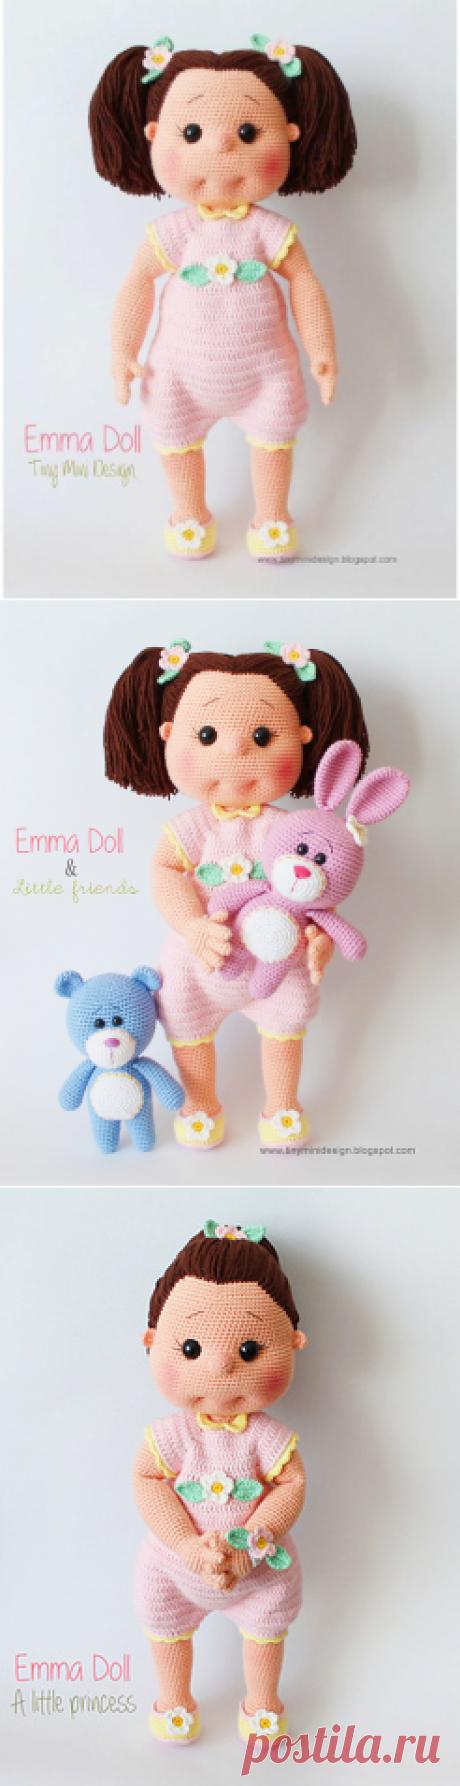 Куколка Эмма, автор Tiny Mini Design.